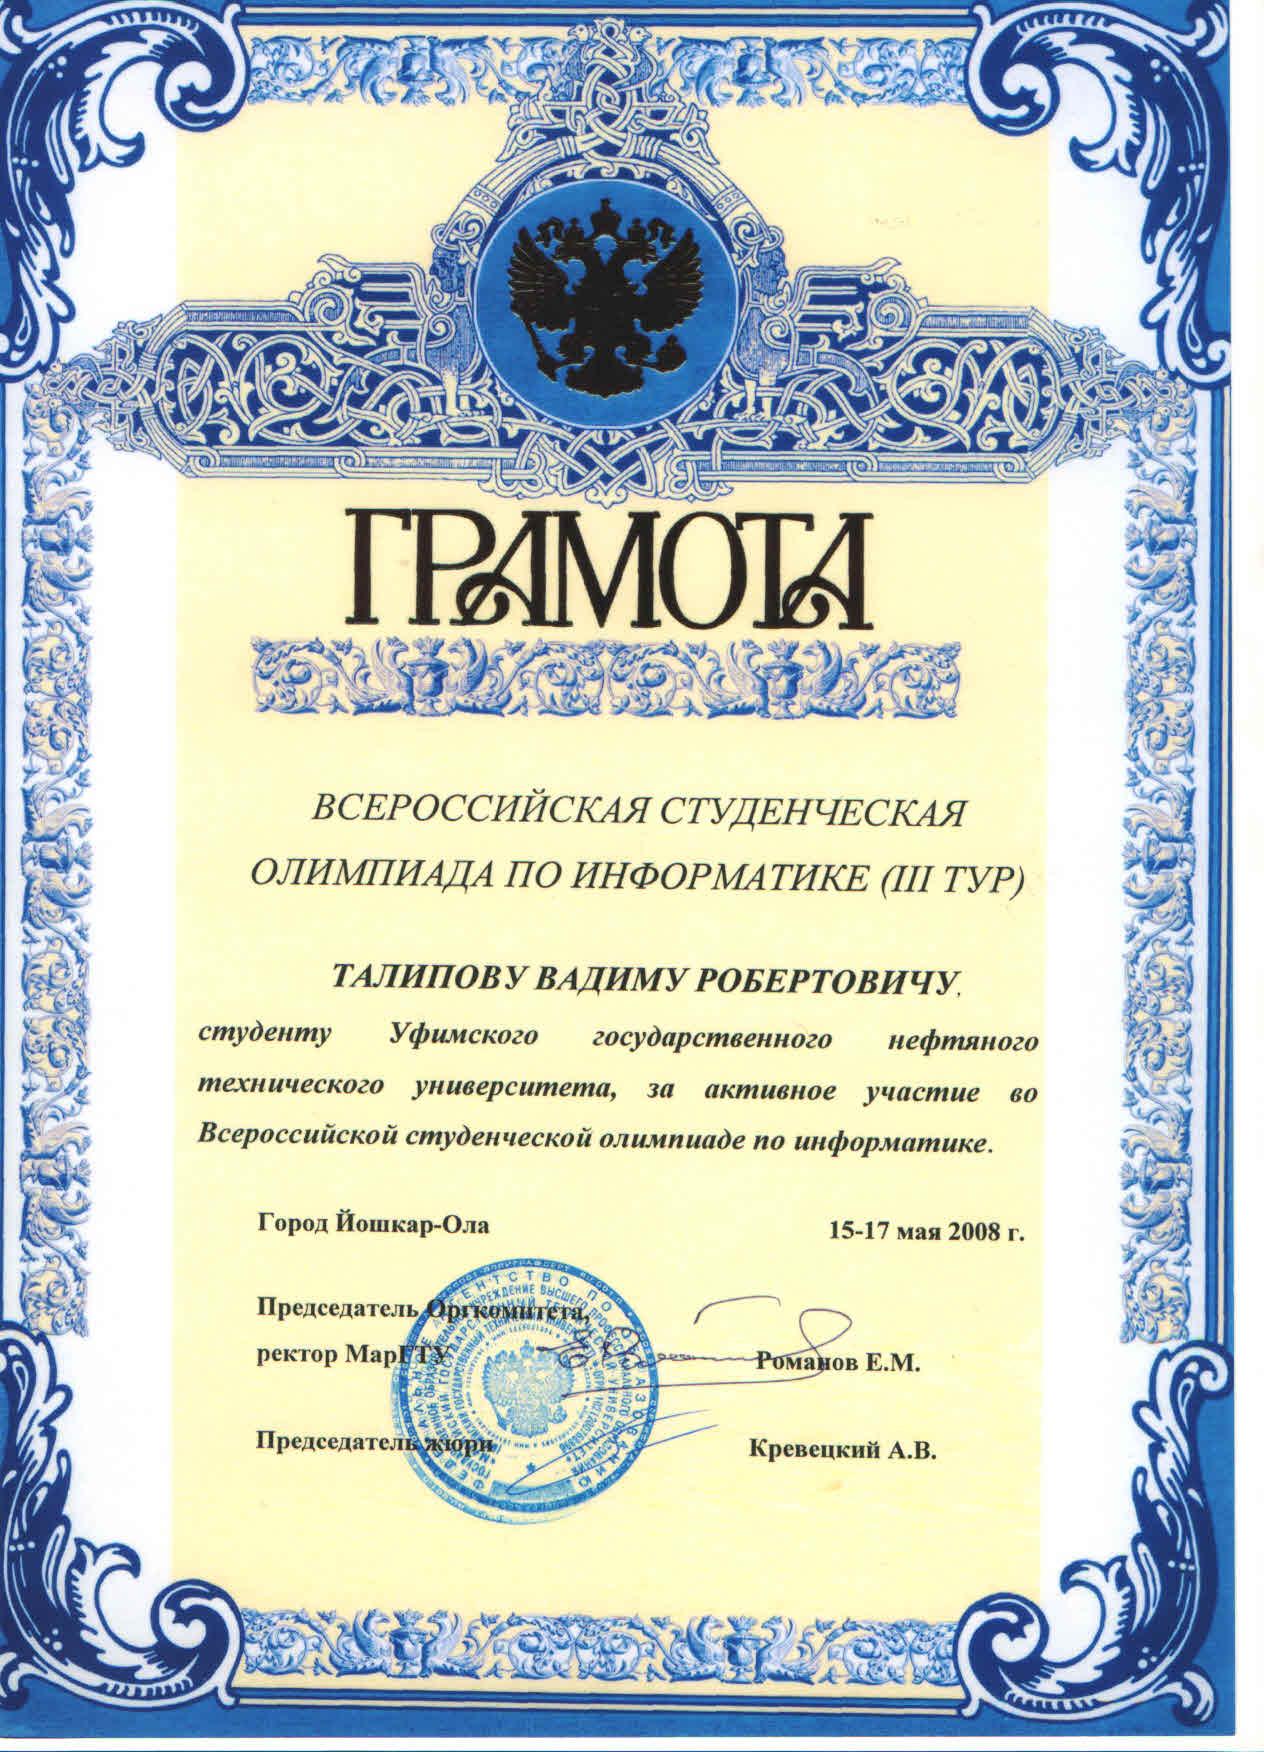 Талипов, #кафедравтик, #ВТИК, #ФАПП, #УГНТУ, #USPTU